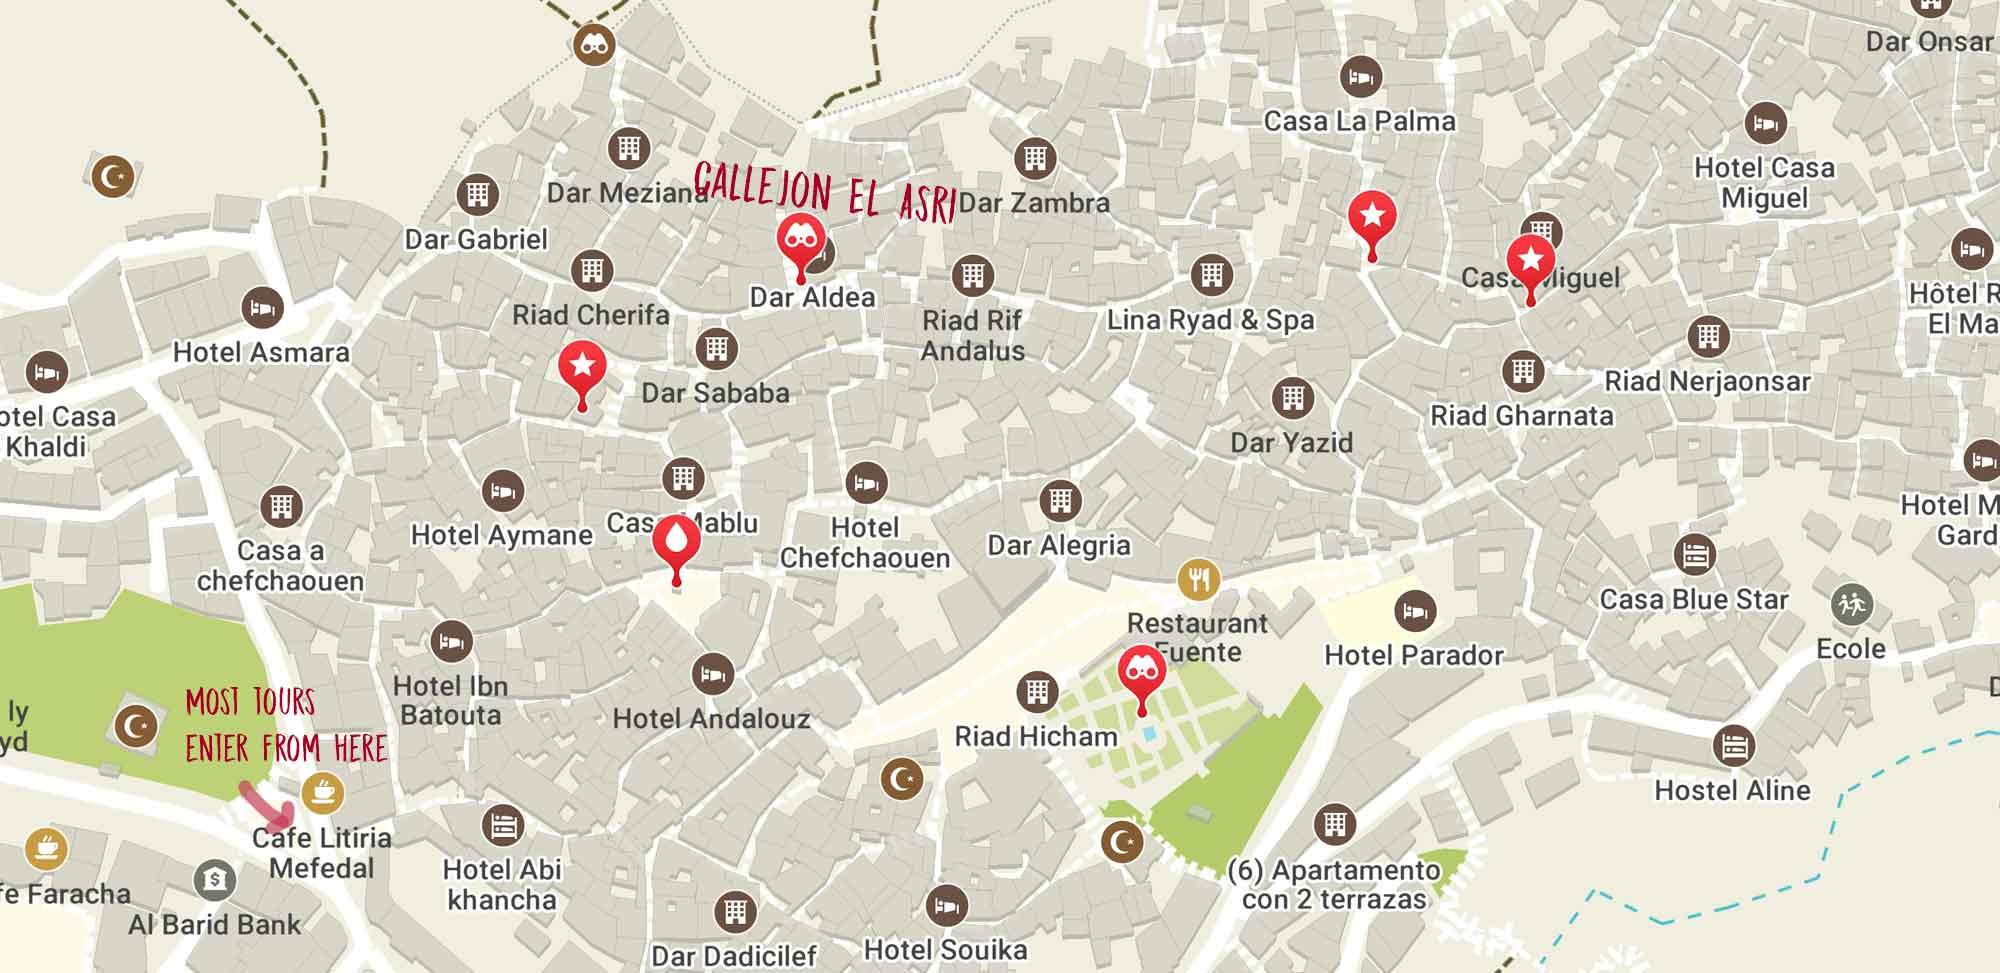 chefchaouen-el-asri-map